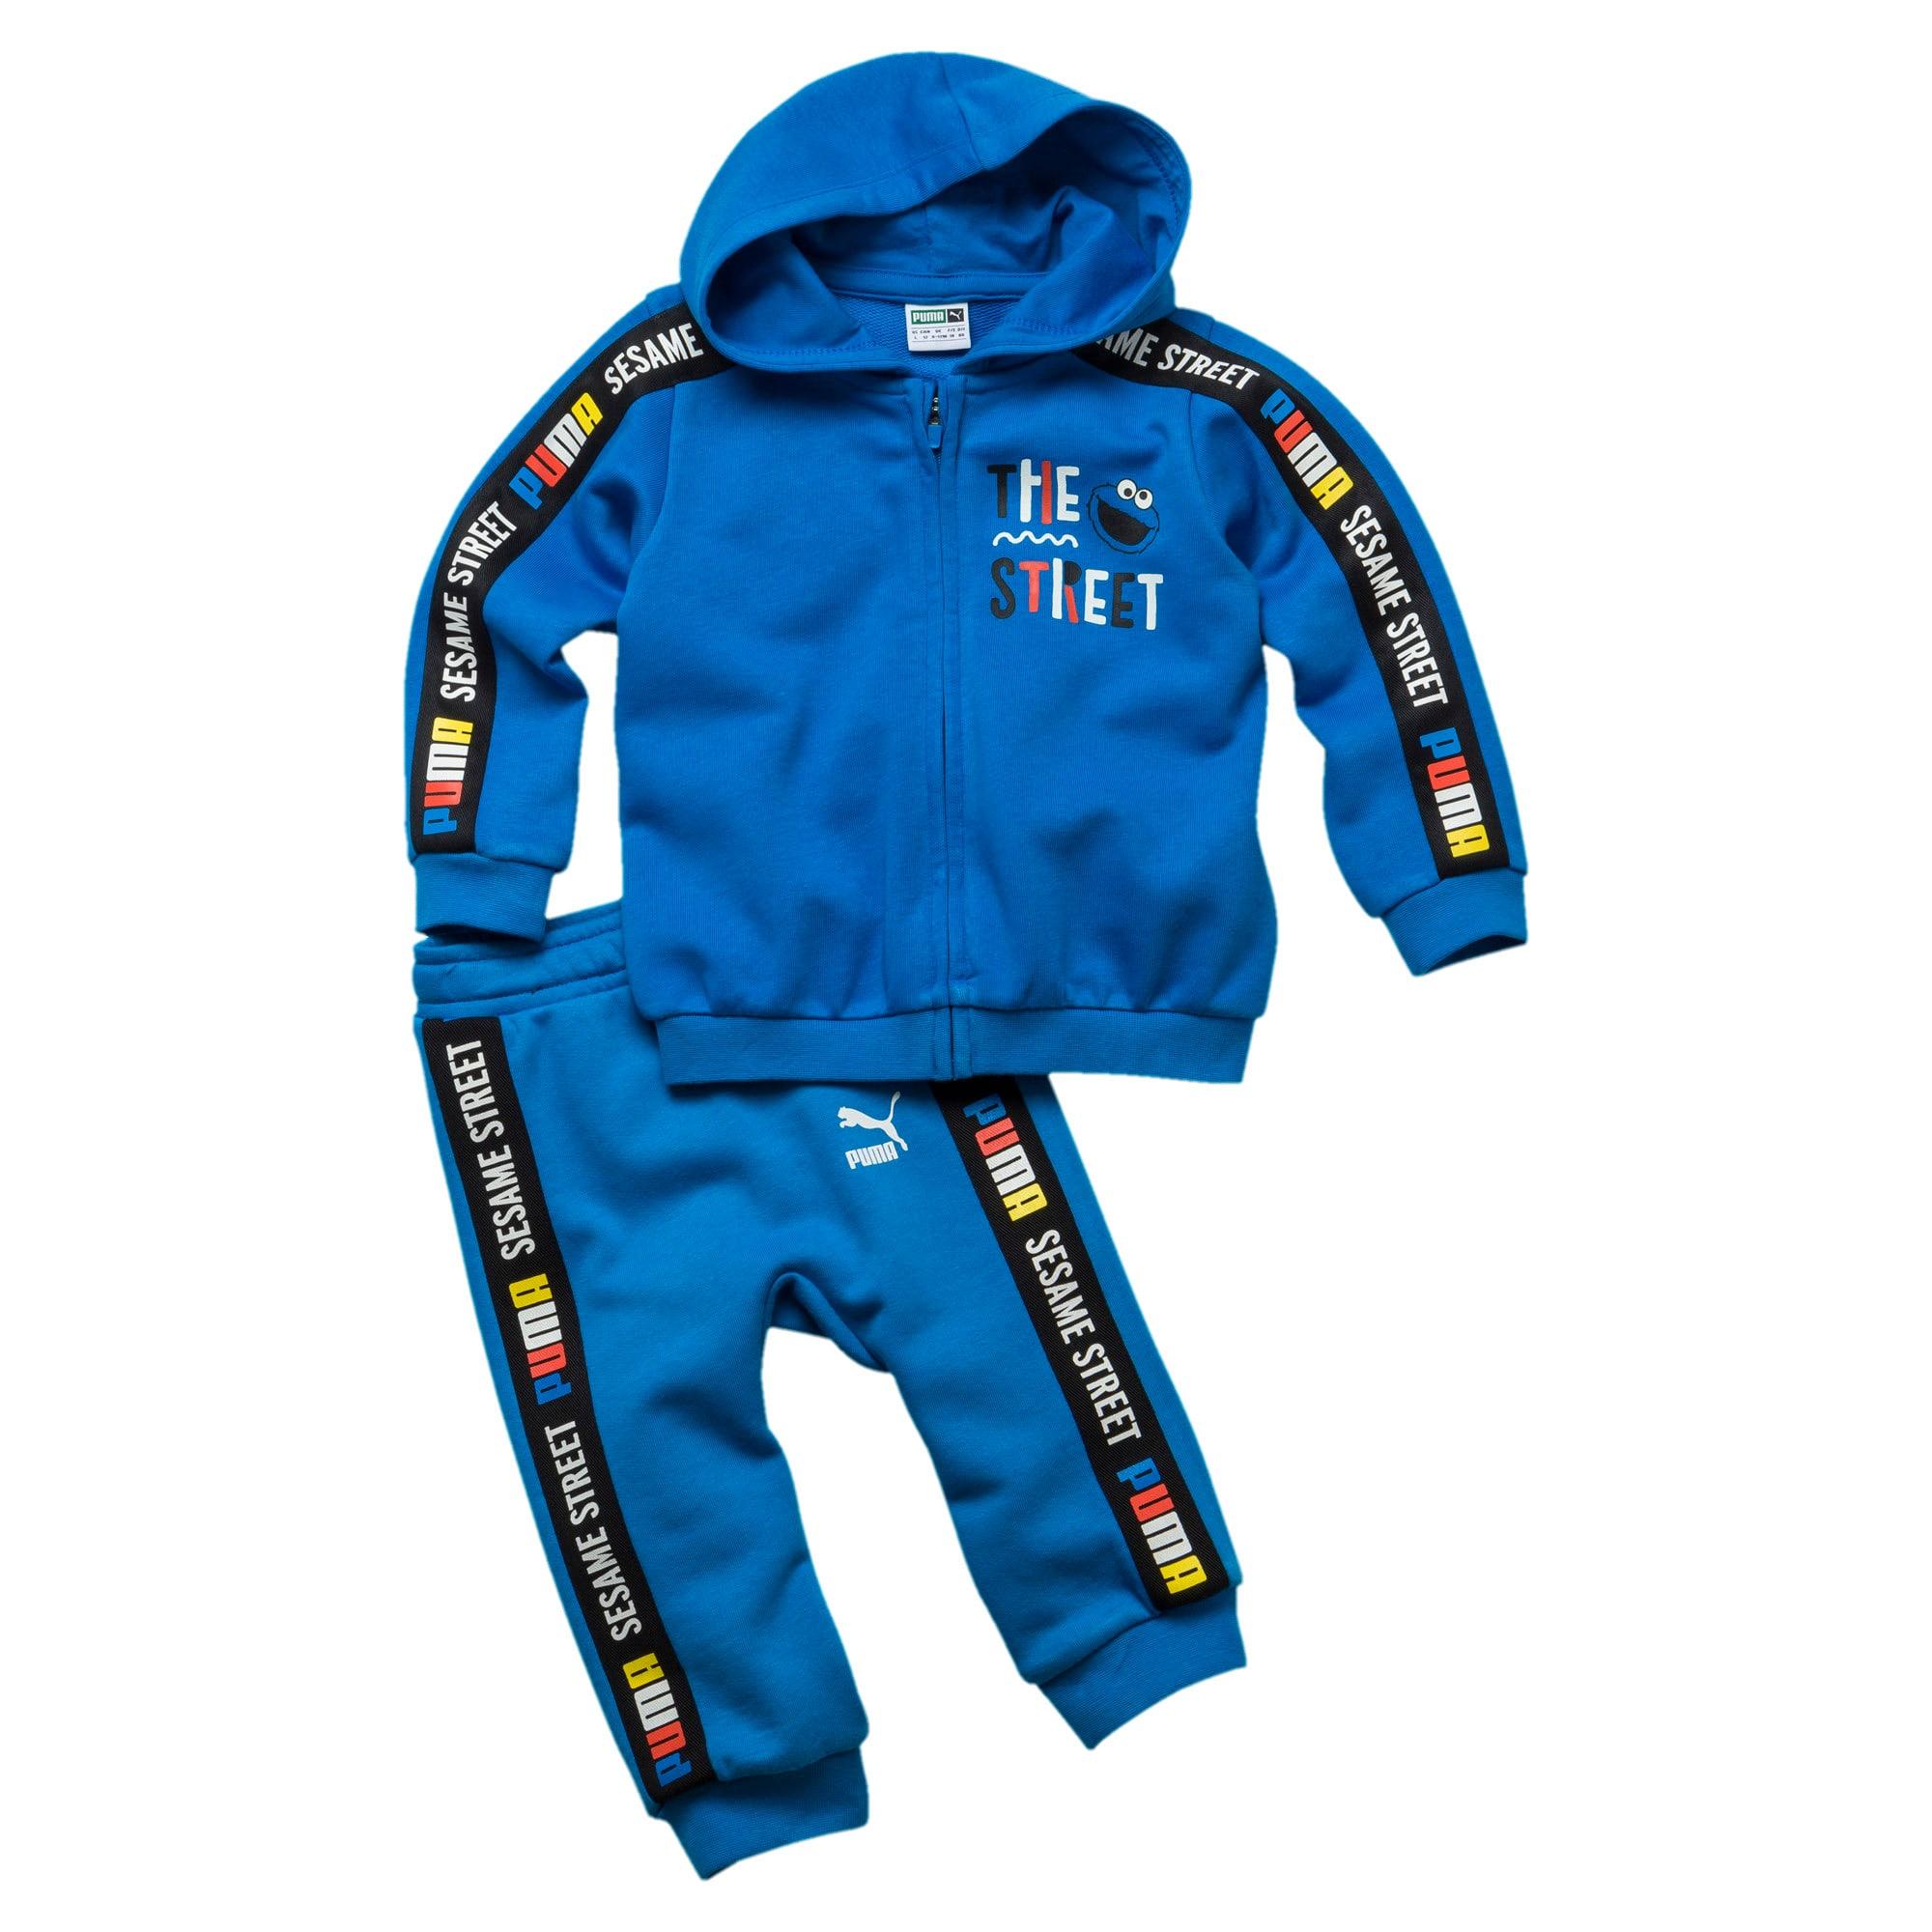 Thumbnail 1 of Sesame Street baby-trainingspak met capuchon voor jongens, Indigo Bunting, medium